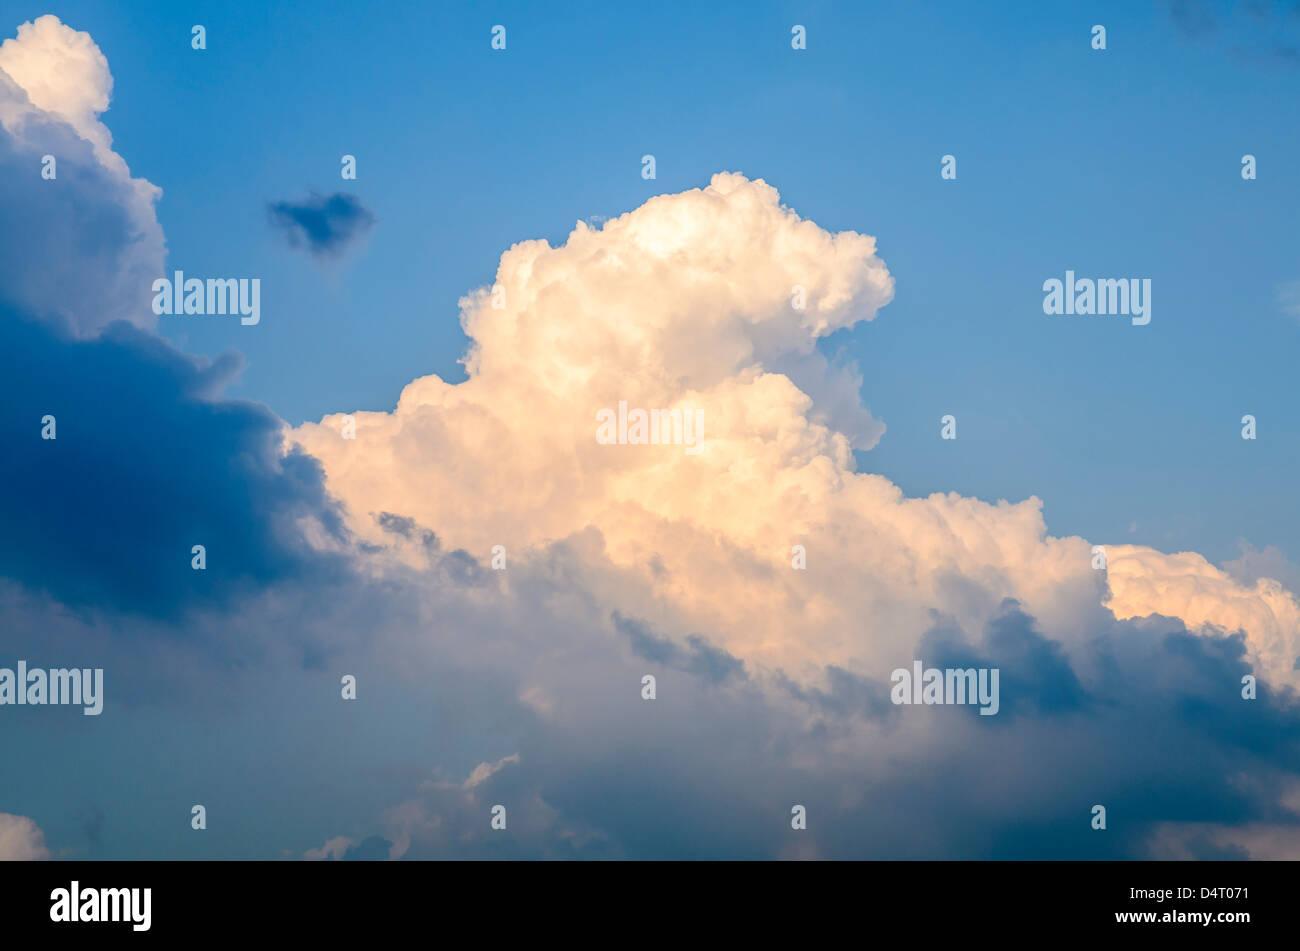 A Cumulonimbus cloud against a blue sky. - Stock Image